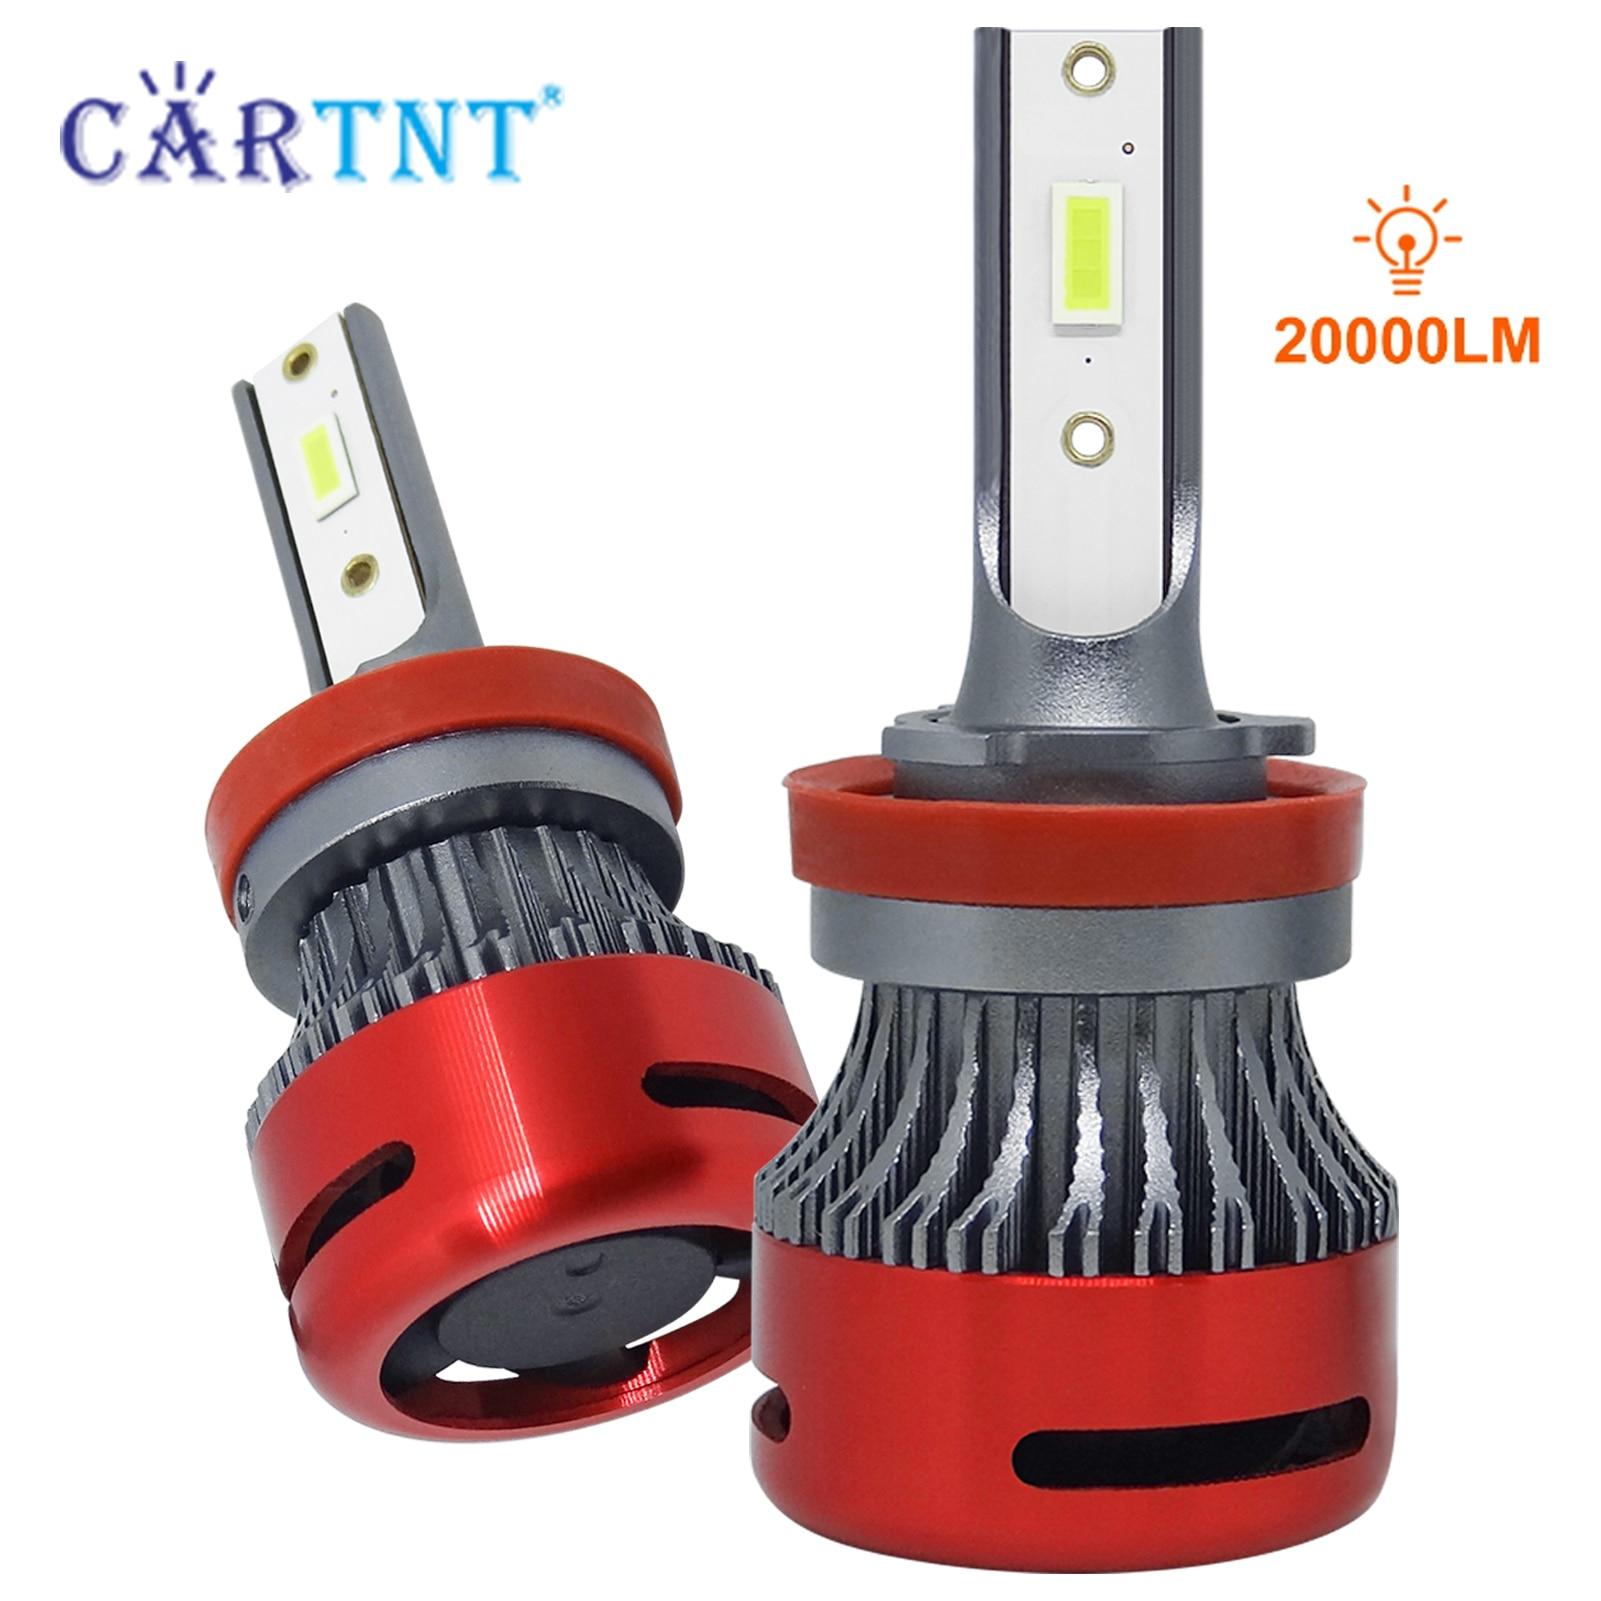 CarTnT 2 шт. супер яркий HB3 светодиодный лампы 20000LM 150 Вт Автомобильные Лампы 9012 H7 H8 H11 H1 H3 9005 9006 HB3 HB4 H13 Автомобильный светодиодный лампы для передн...